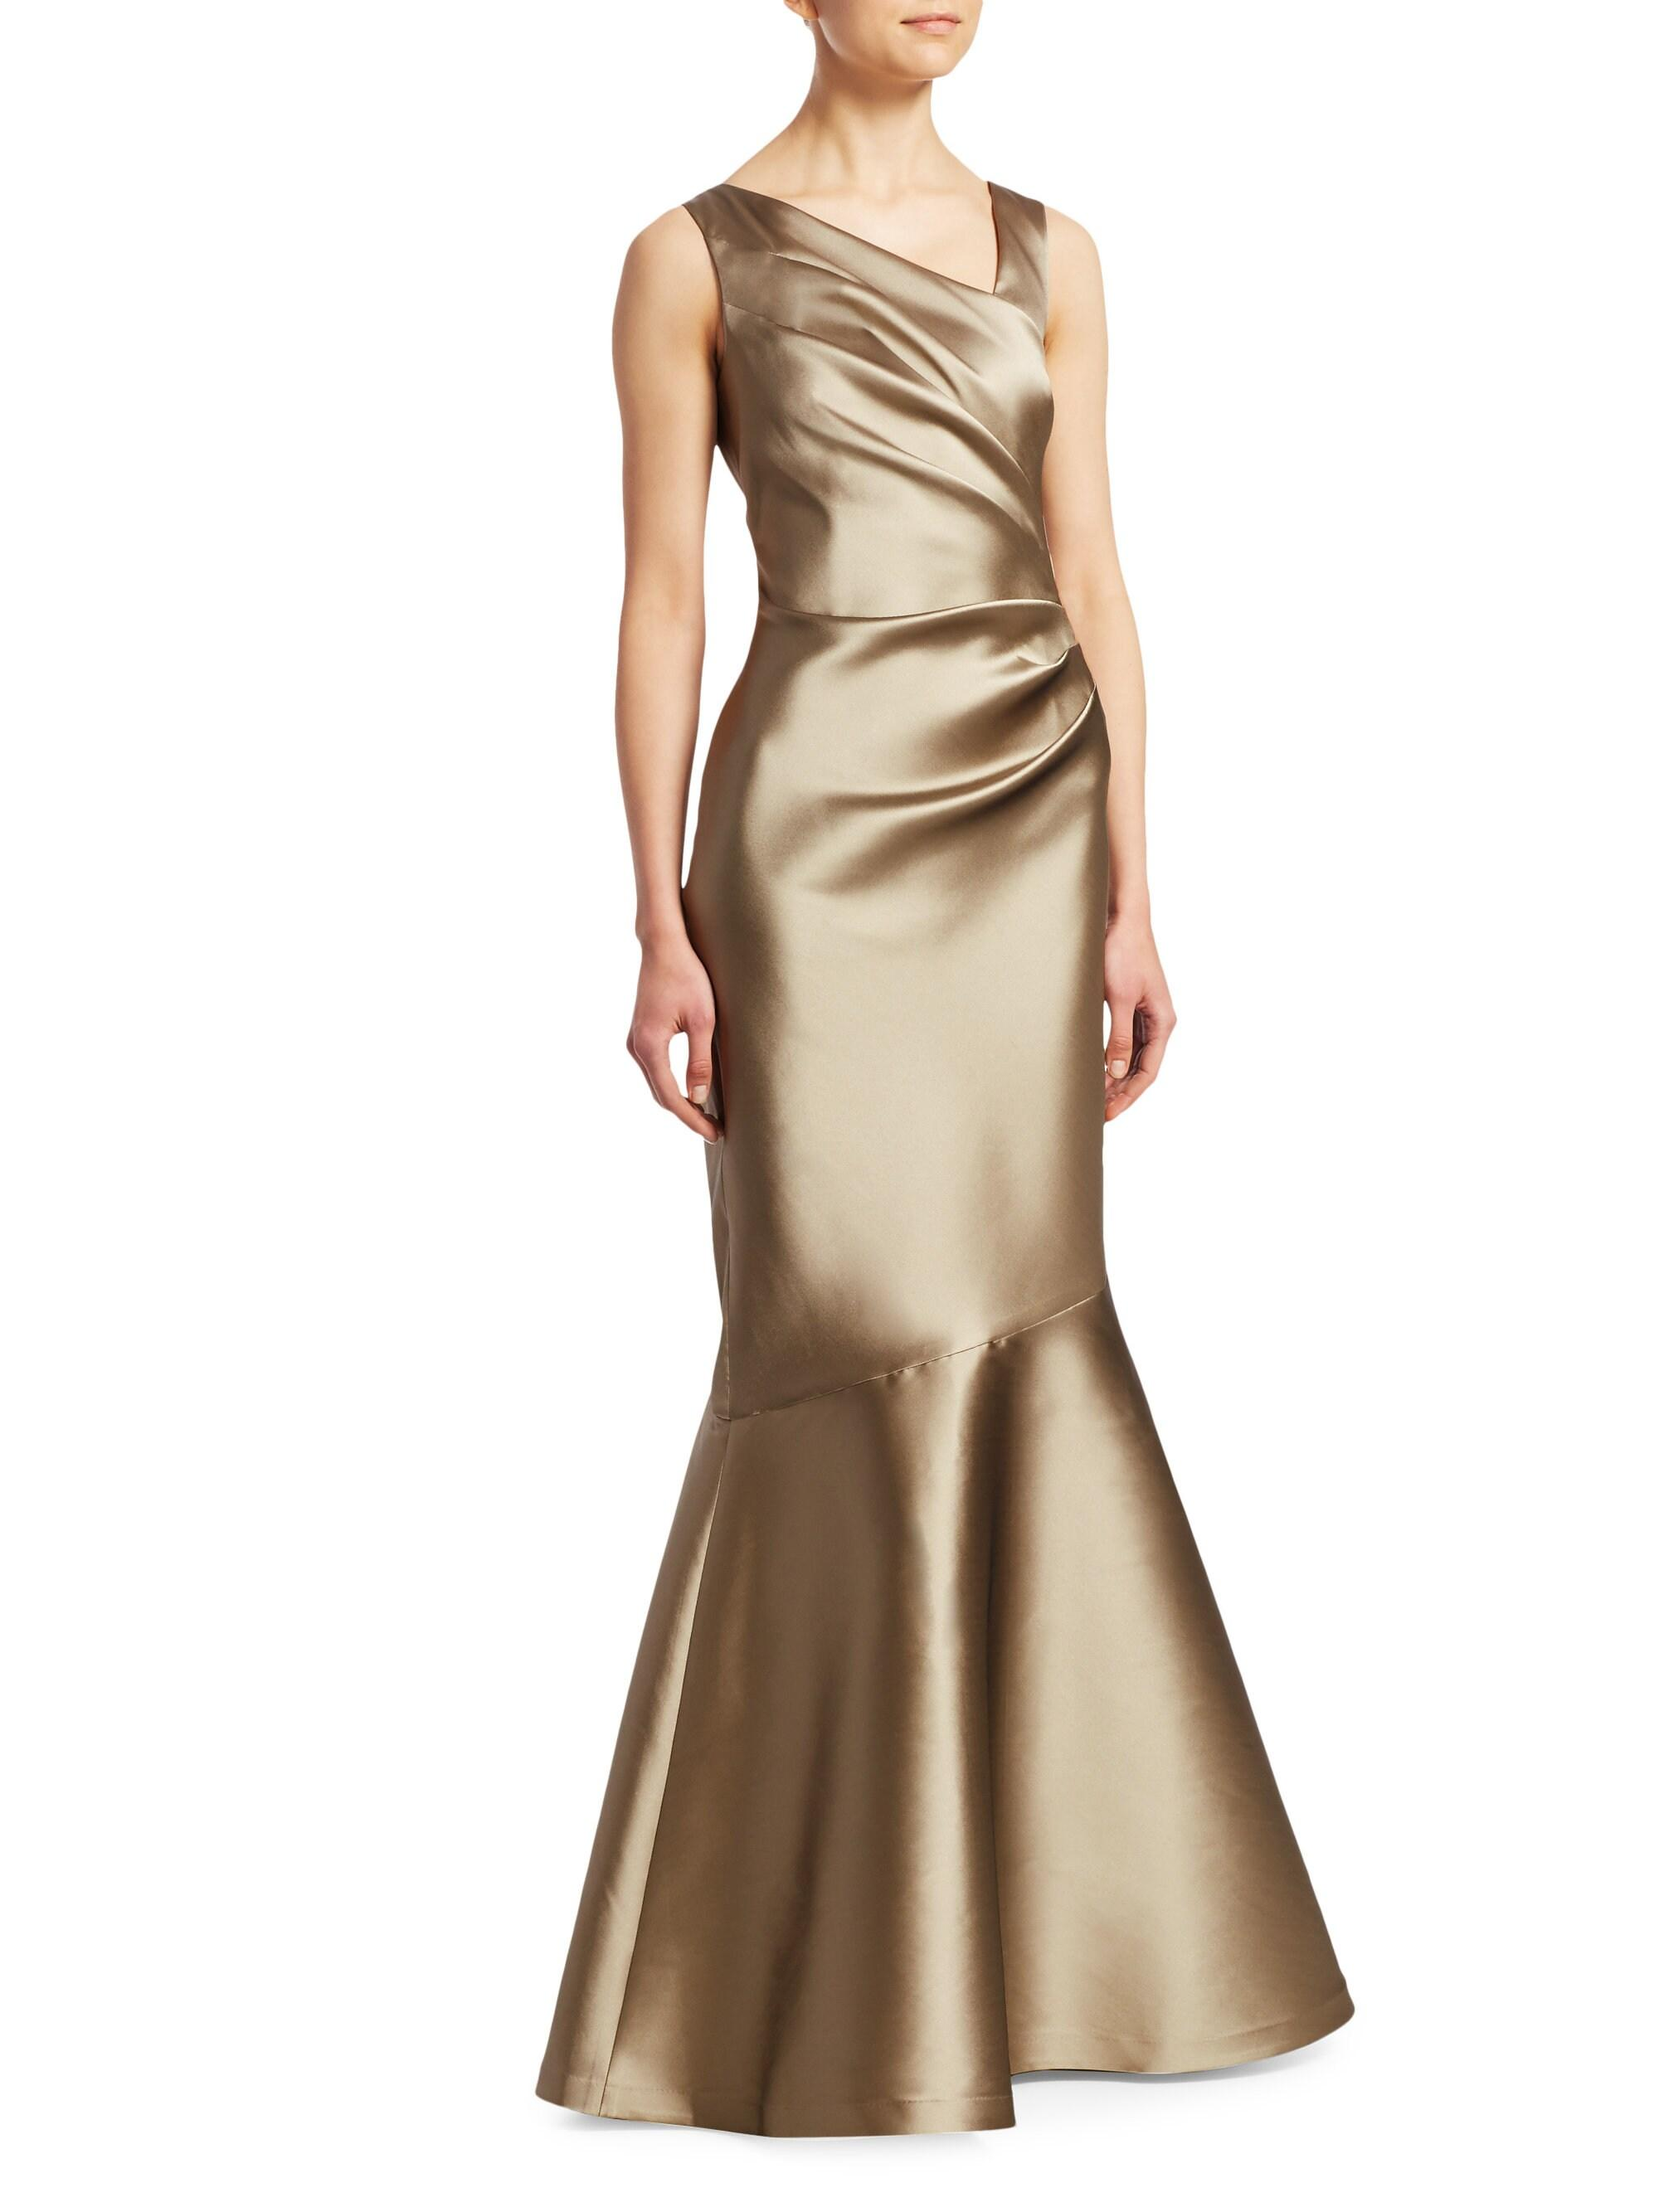 aa3dc0bff7977 Teri Jon - Metallic Stretch Taffeta Mermaid Gown - Lyst. View fullscreen